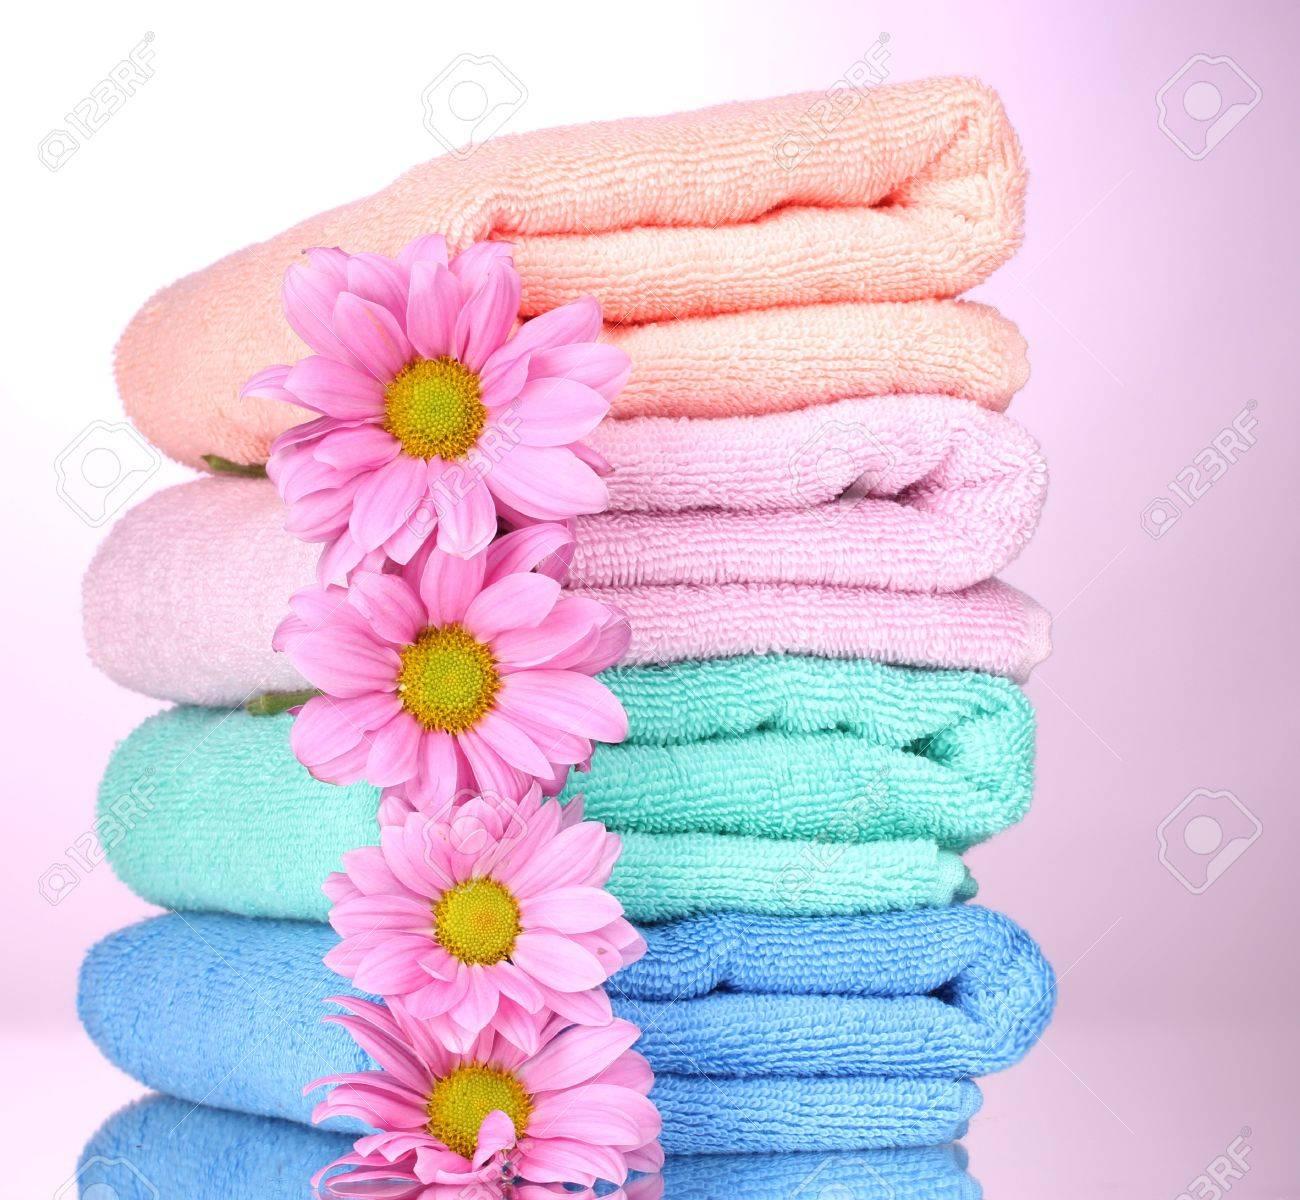 bath towel images & stock pictures. royalty free bath towel photos